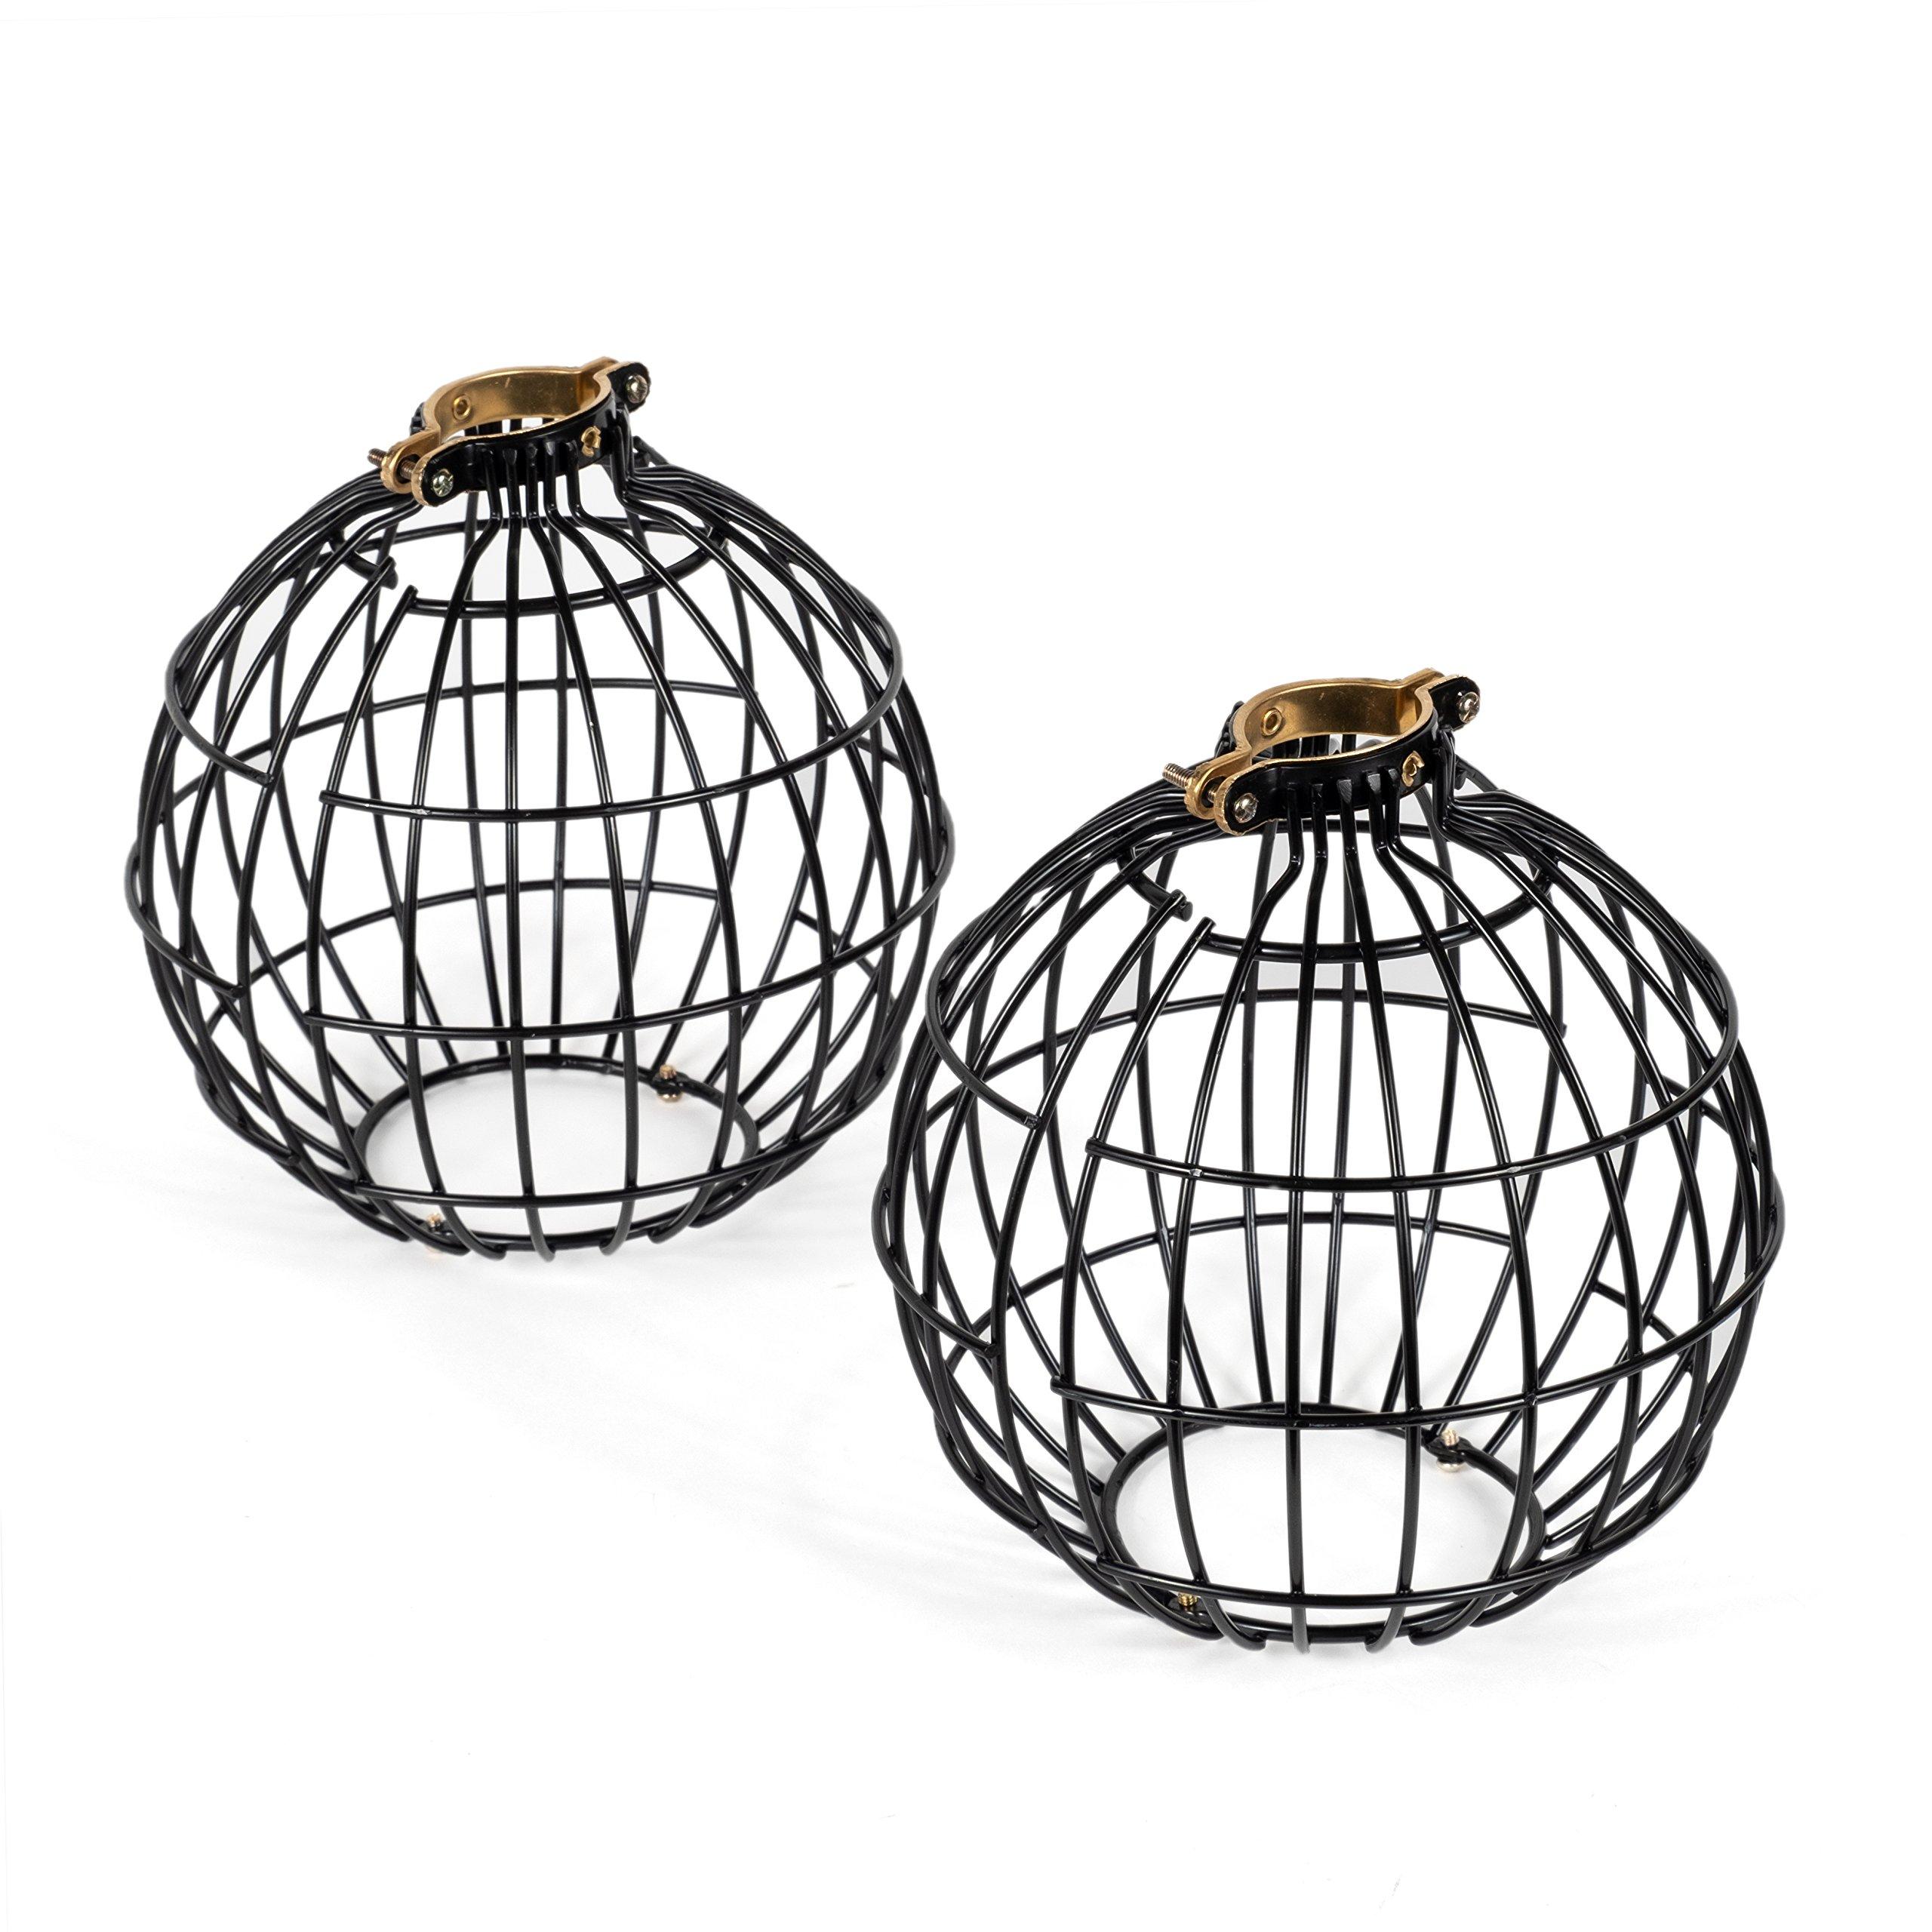 Rustic State Vintage Design Metal Light Cage Guard – Decorative Lamp Shade Black Set of 2Rustic State Vintage Design Metal Light Cage Guard – Decorative Lamp Shade Black Set of 2 (Globe)